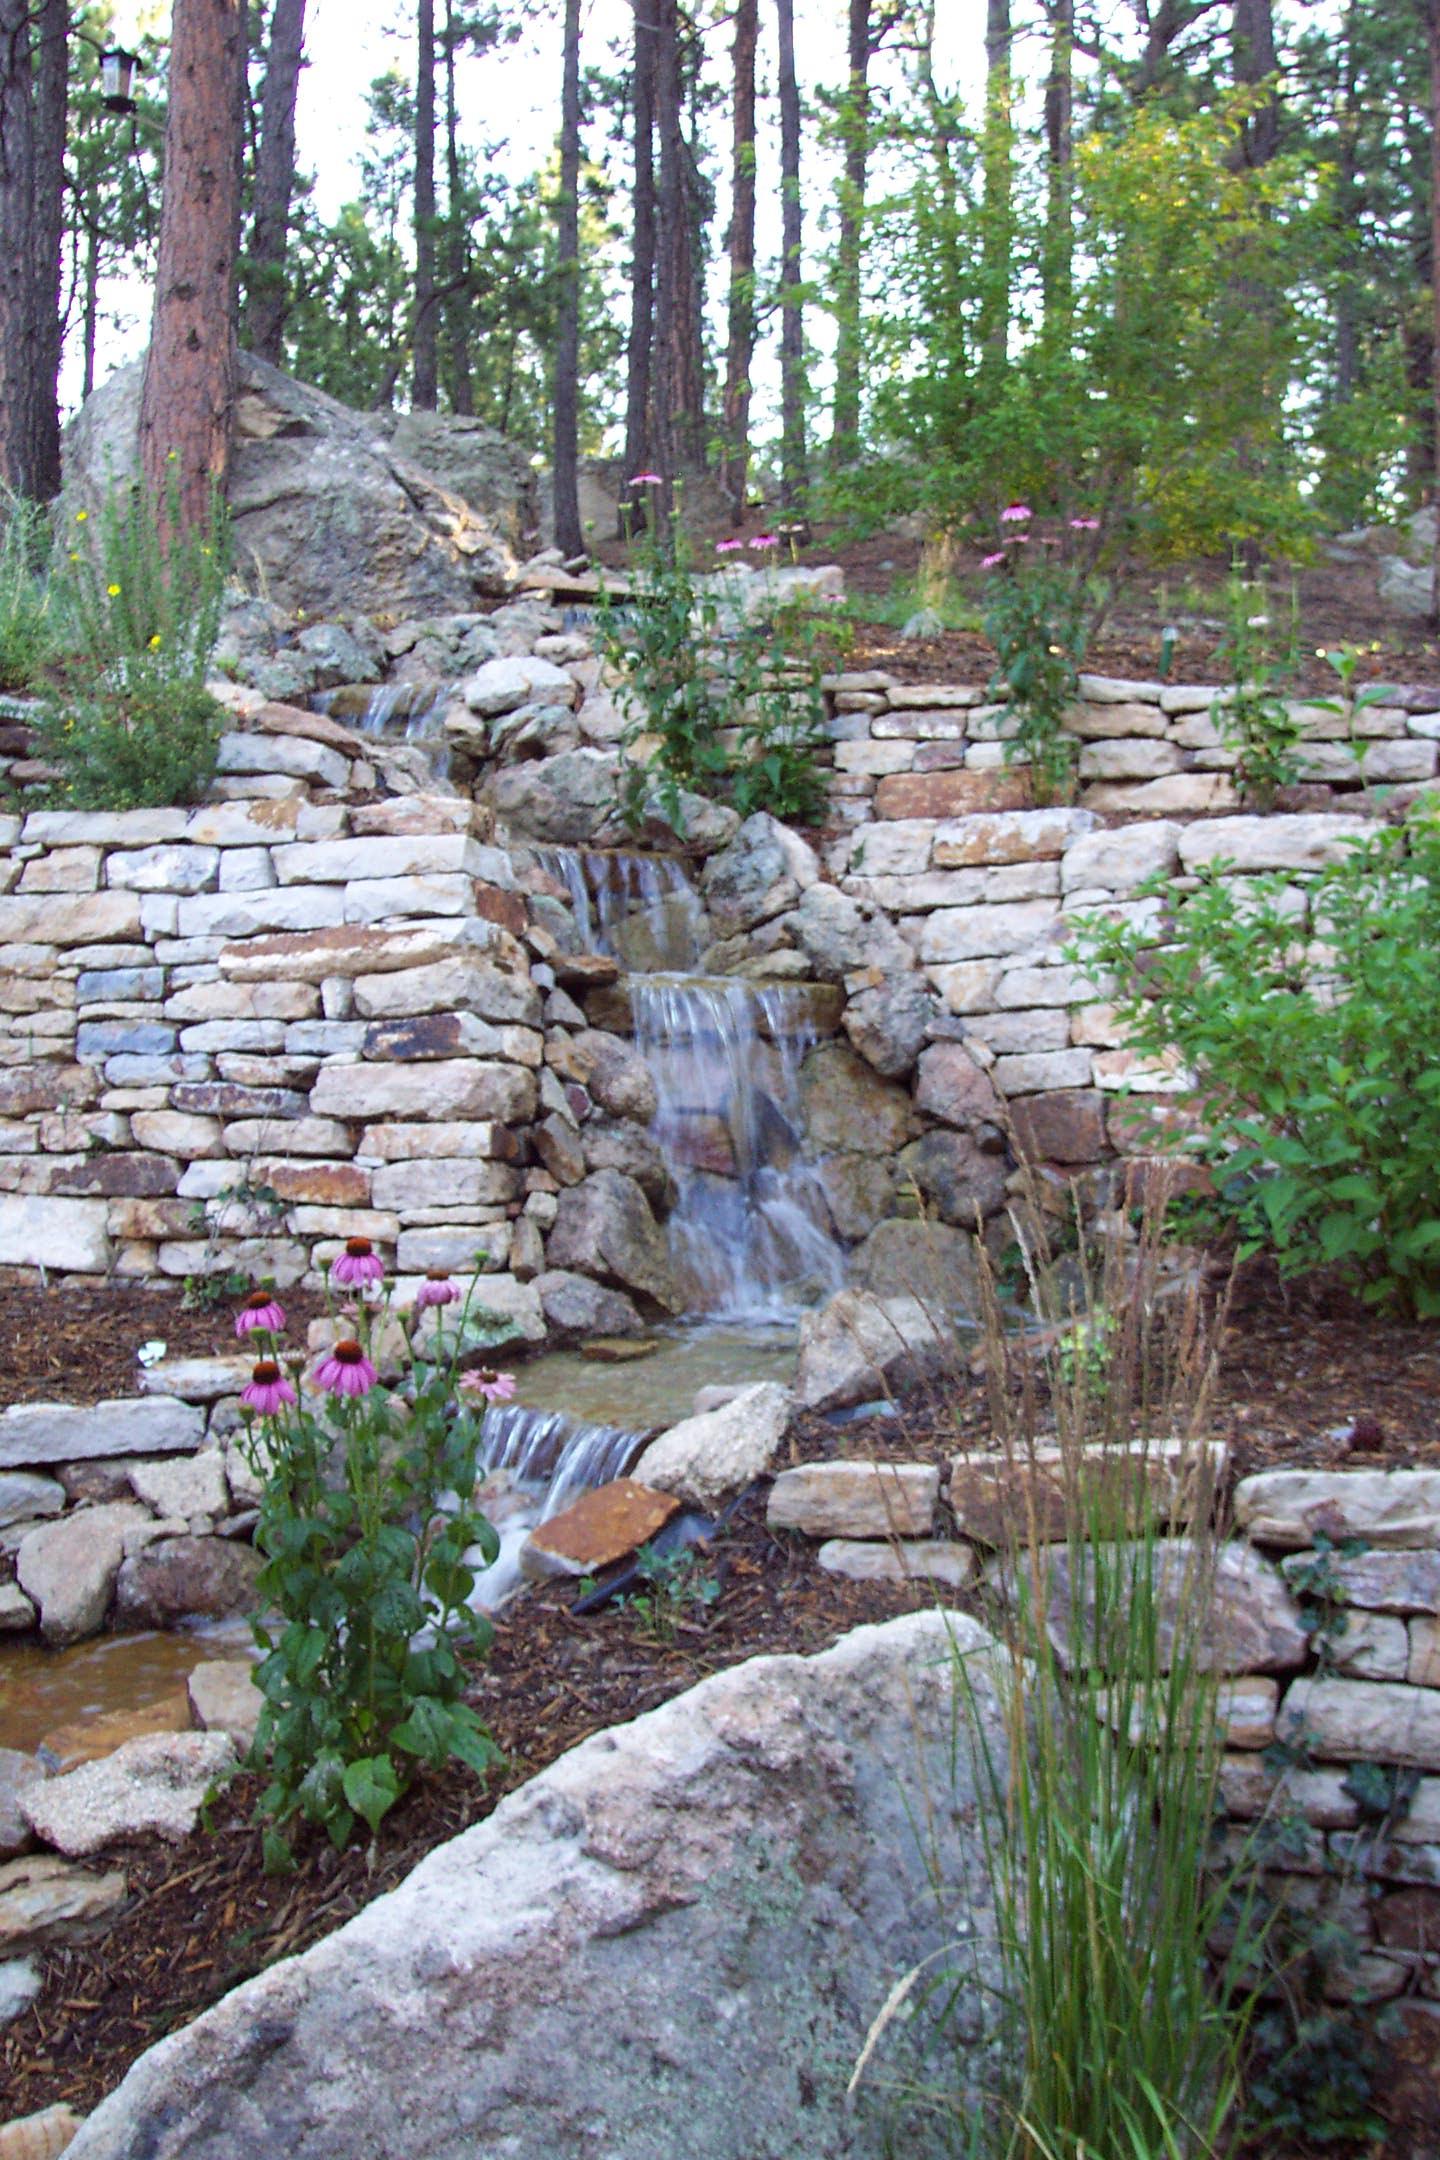 Siloam Stone Walls | Water Feature | Mulch